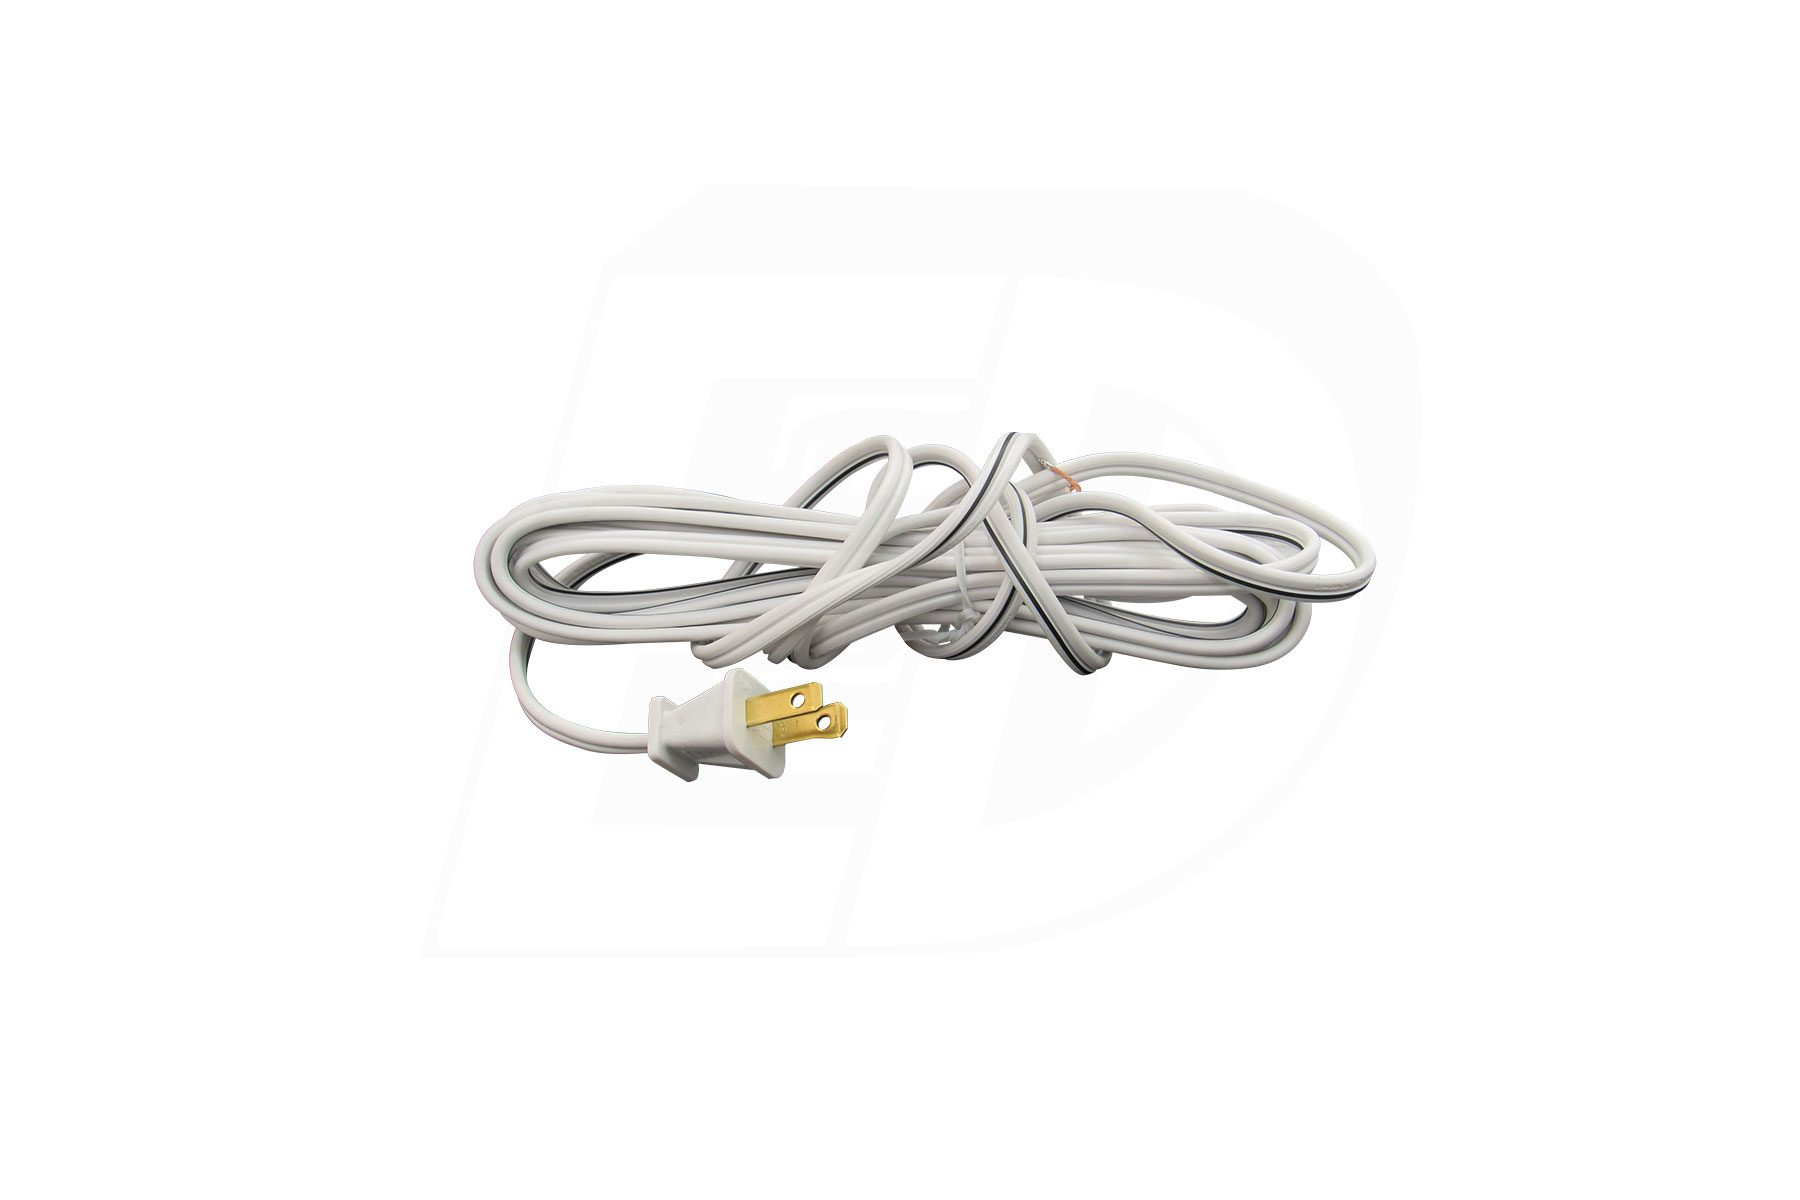 SPT-2 AC Power Cord